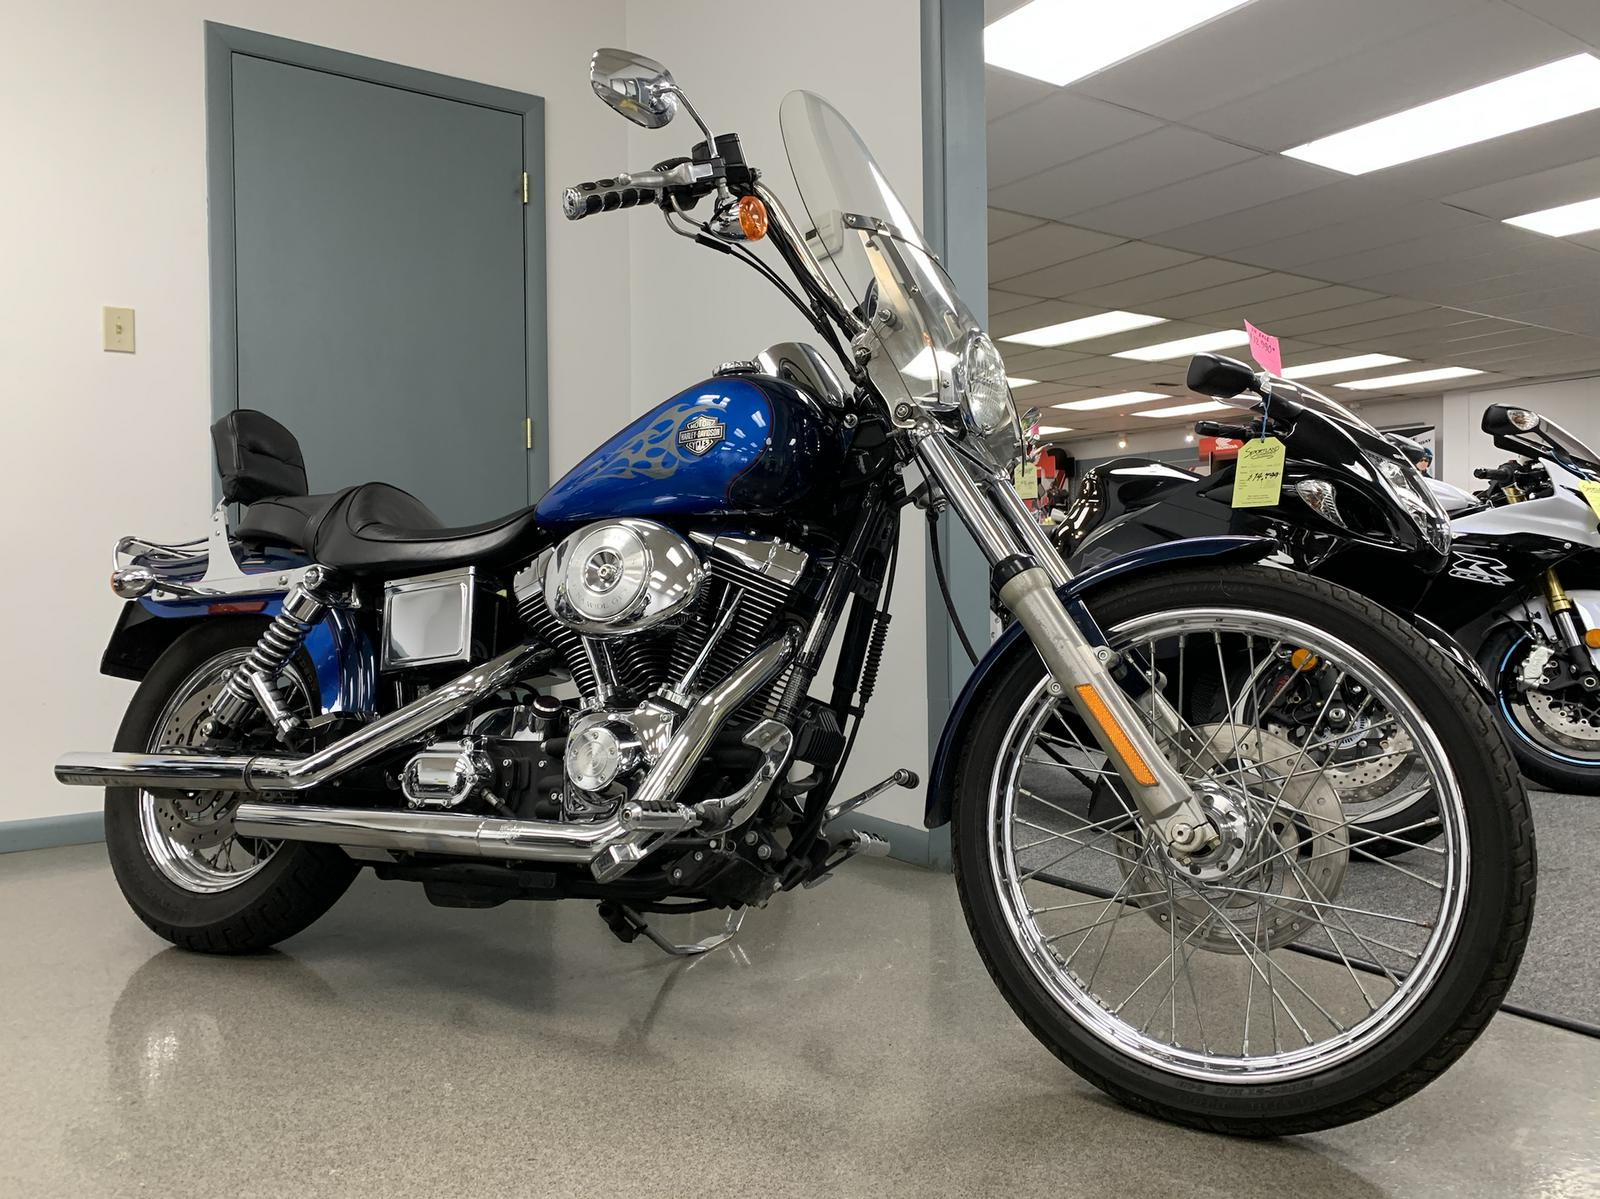 Inventory From Harley Davidson And Ural Sportland Motorsports Urbana Il 217 328 5005